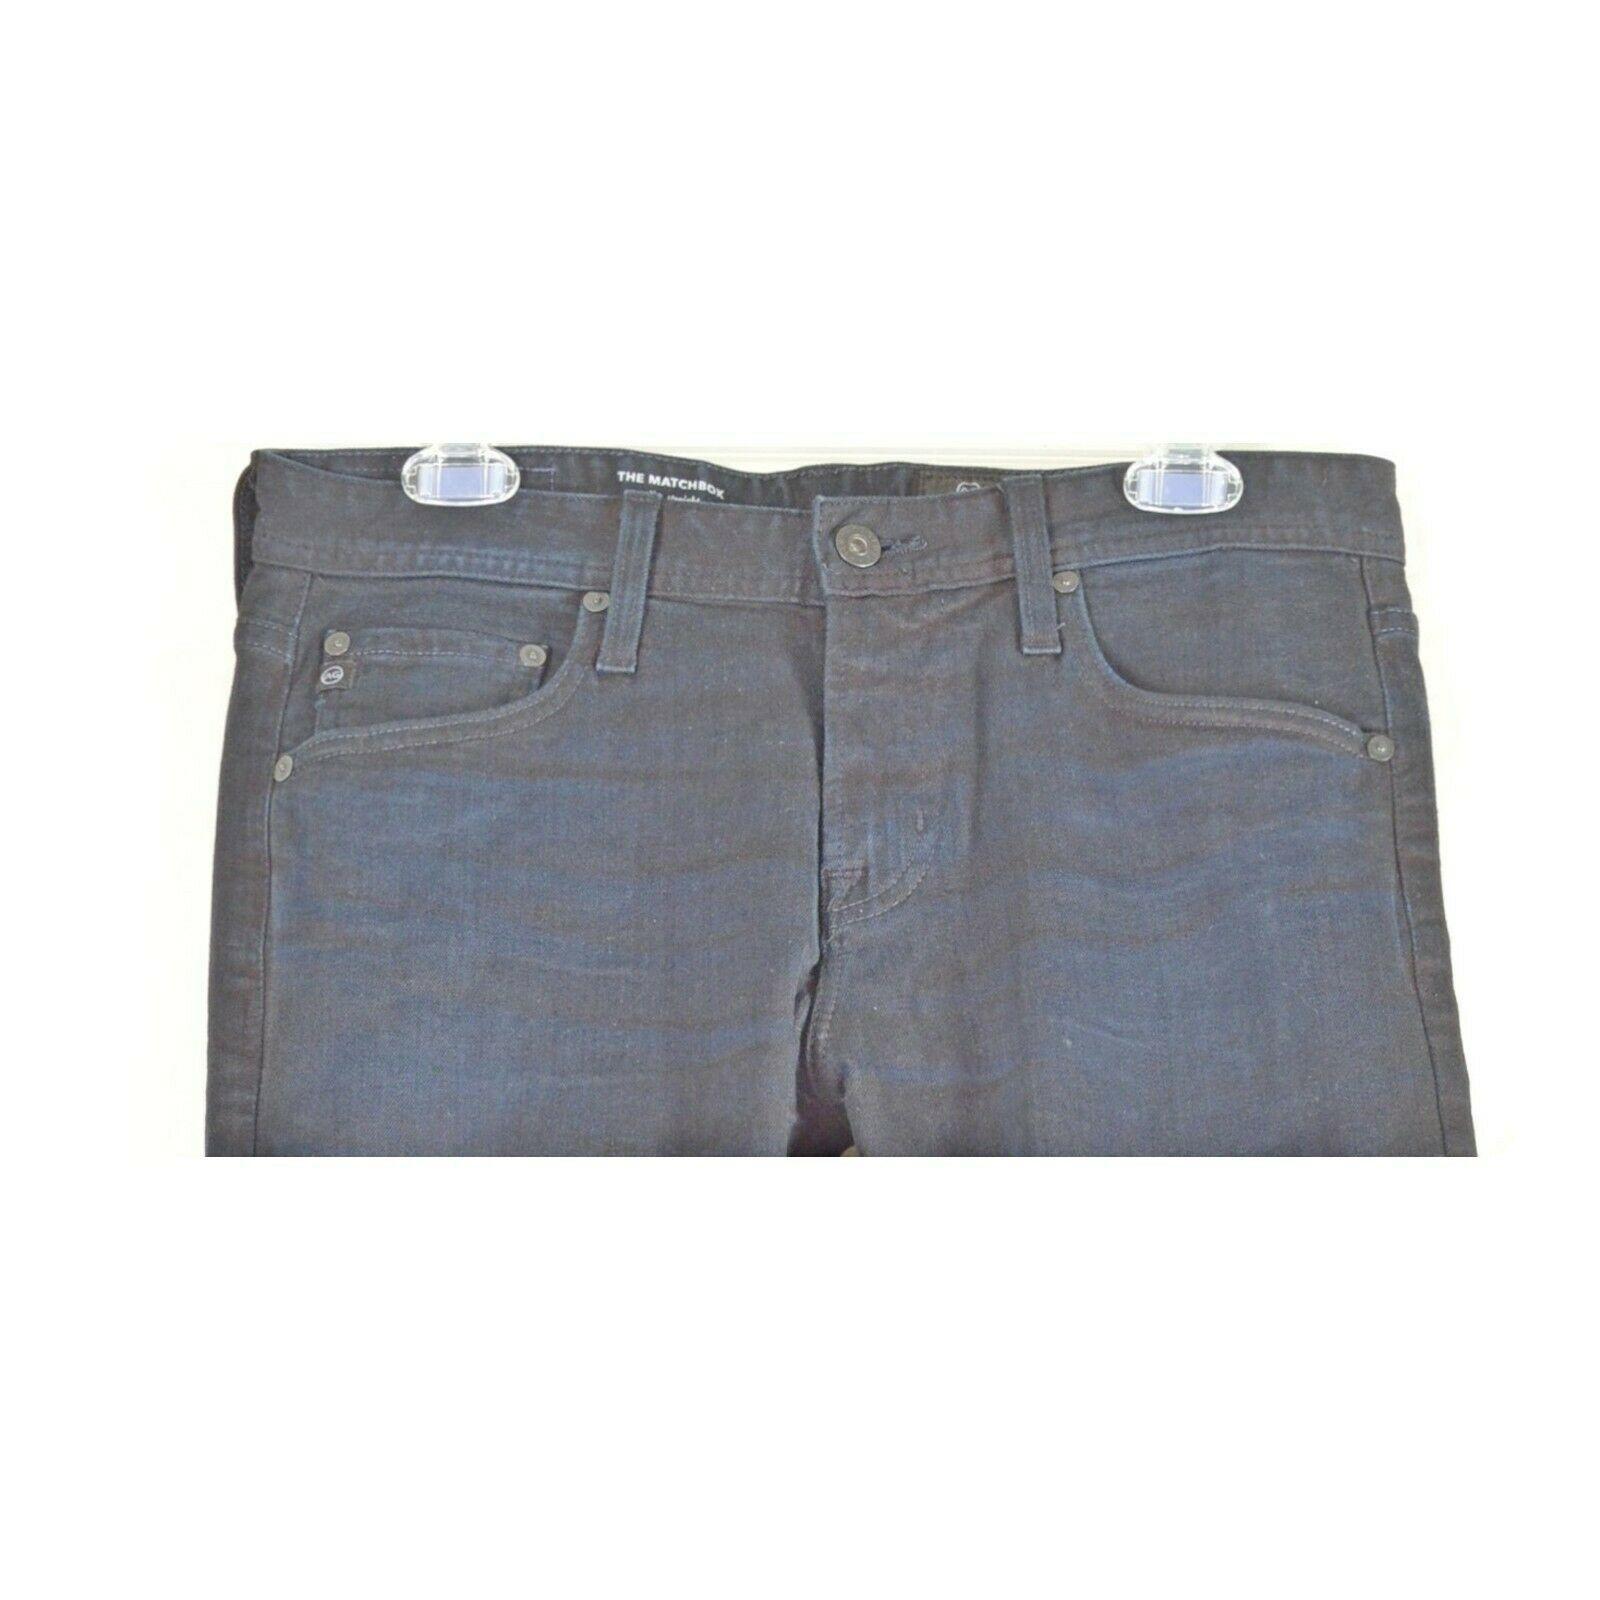 AG Adriano Goldschmied jeans 30 x 34 men Matchbox dark Slim Straight tall unique image 4